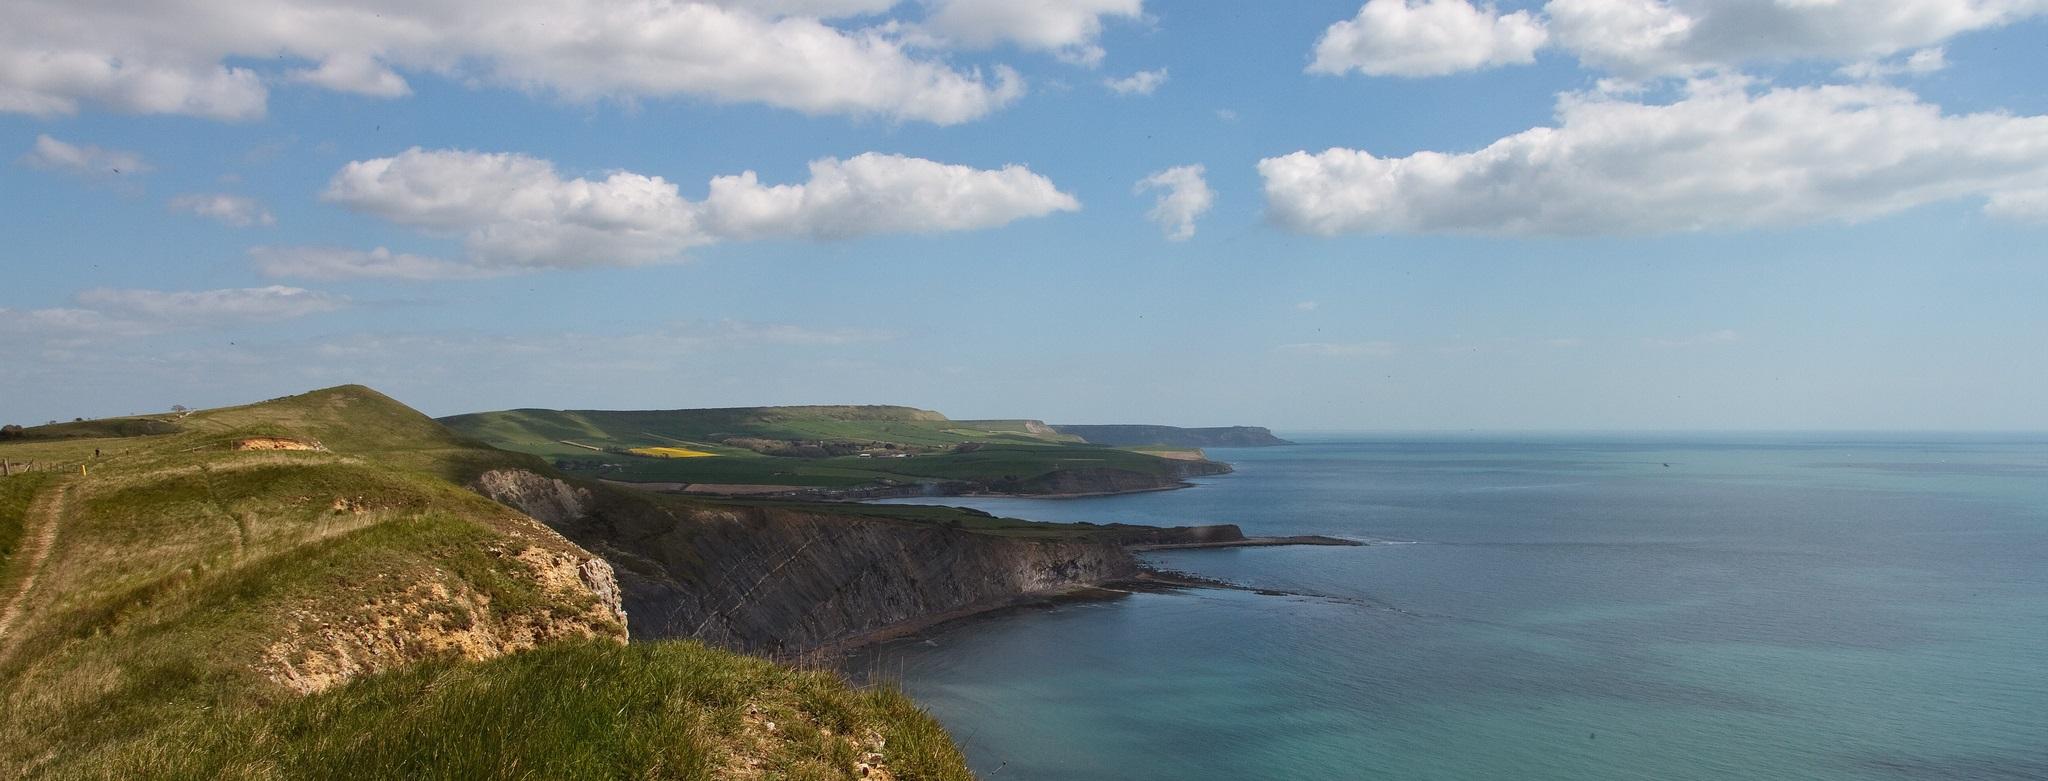 More Coastlines 0167 (Dorset) Chapter 5